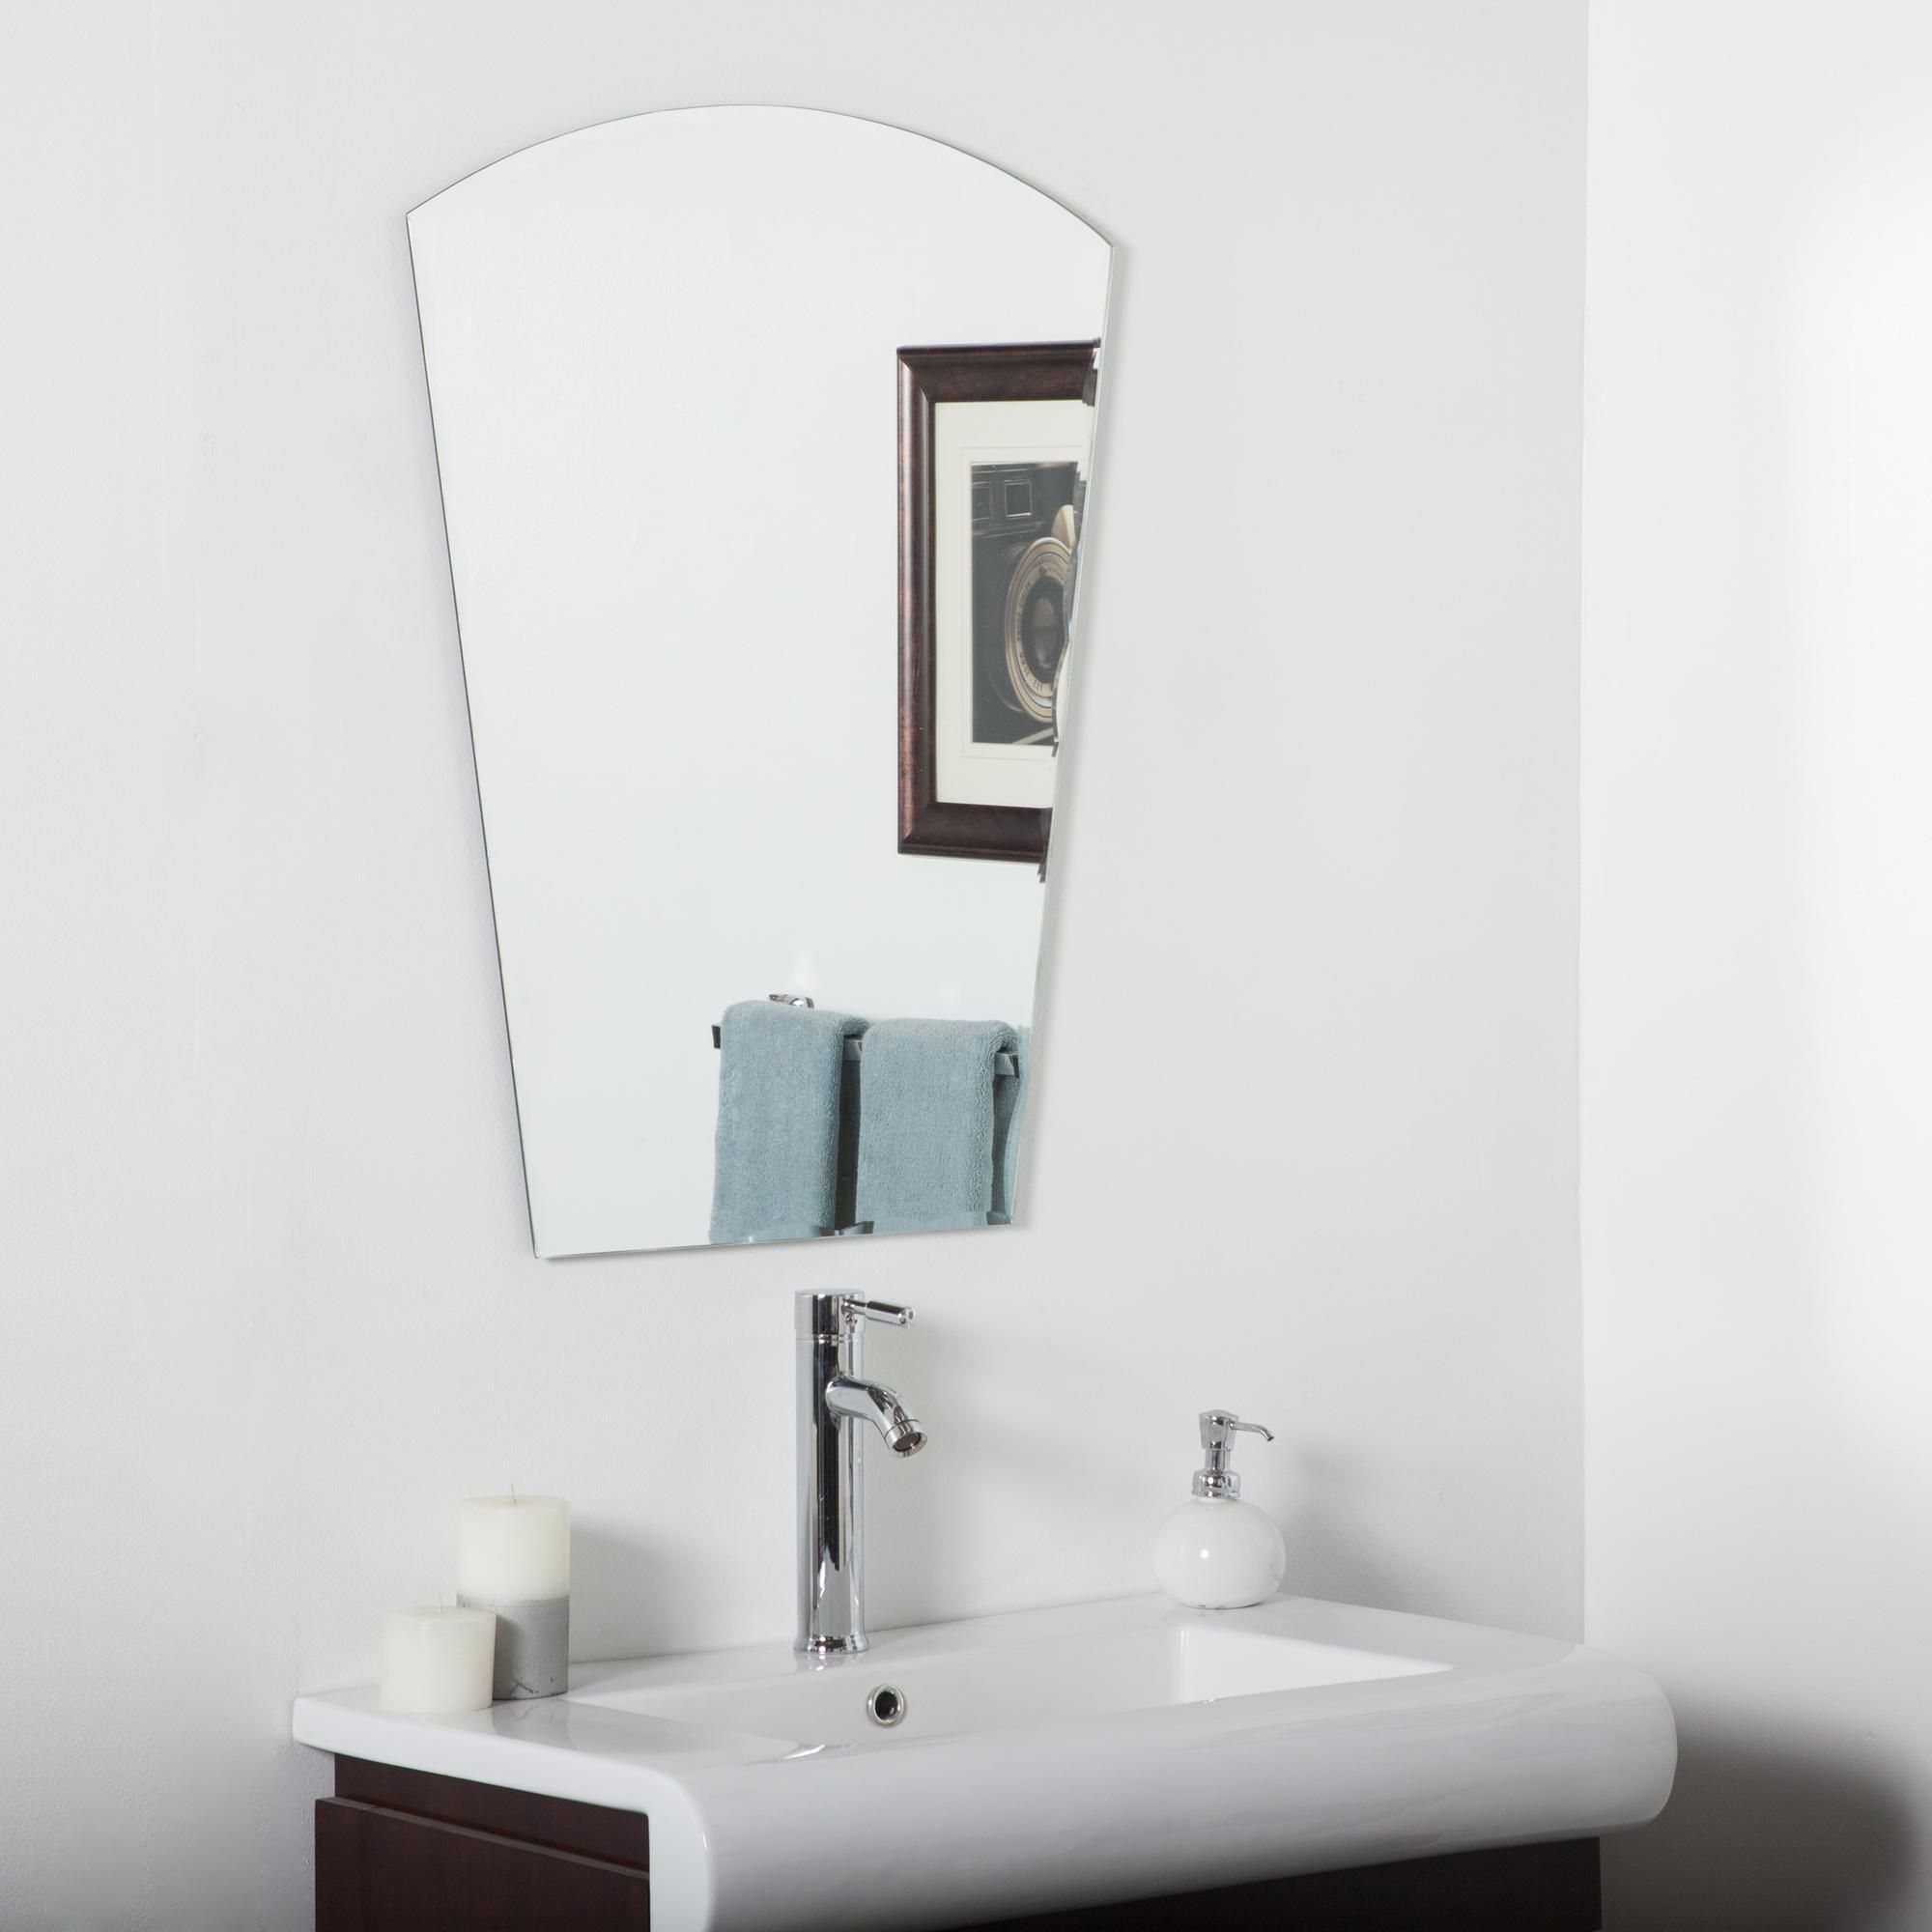 Mirrors Paris 23 1 2 X 31 Arch Top Frameless Wall Mirror In 2020 Mirror Wall Bathroom Modern Bathroom Mirrors Mirror Wall Bedroom